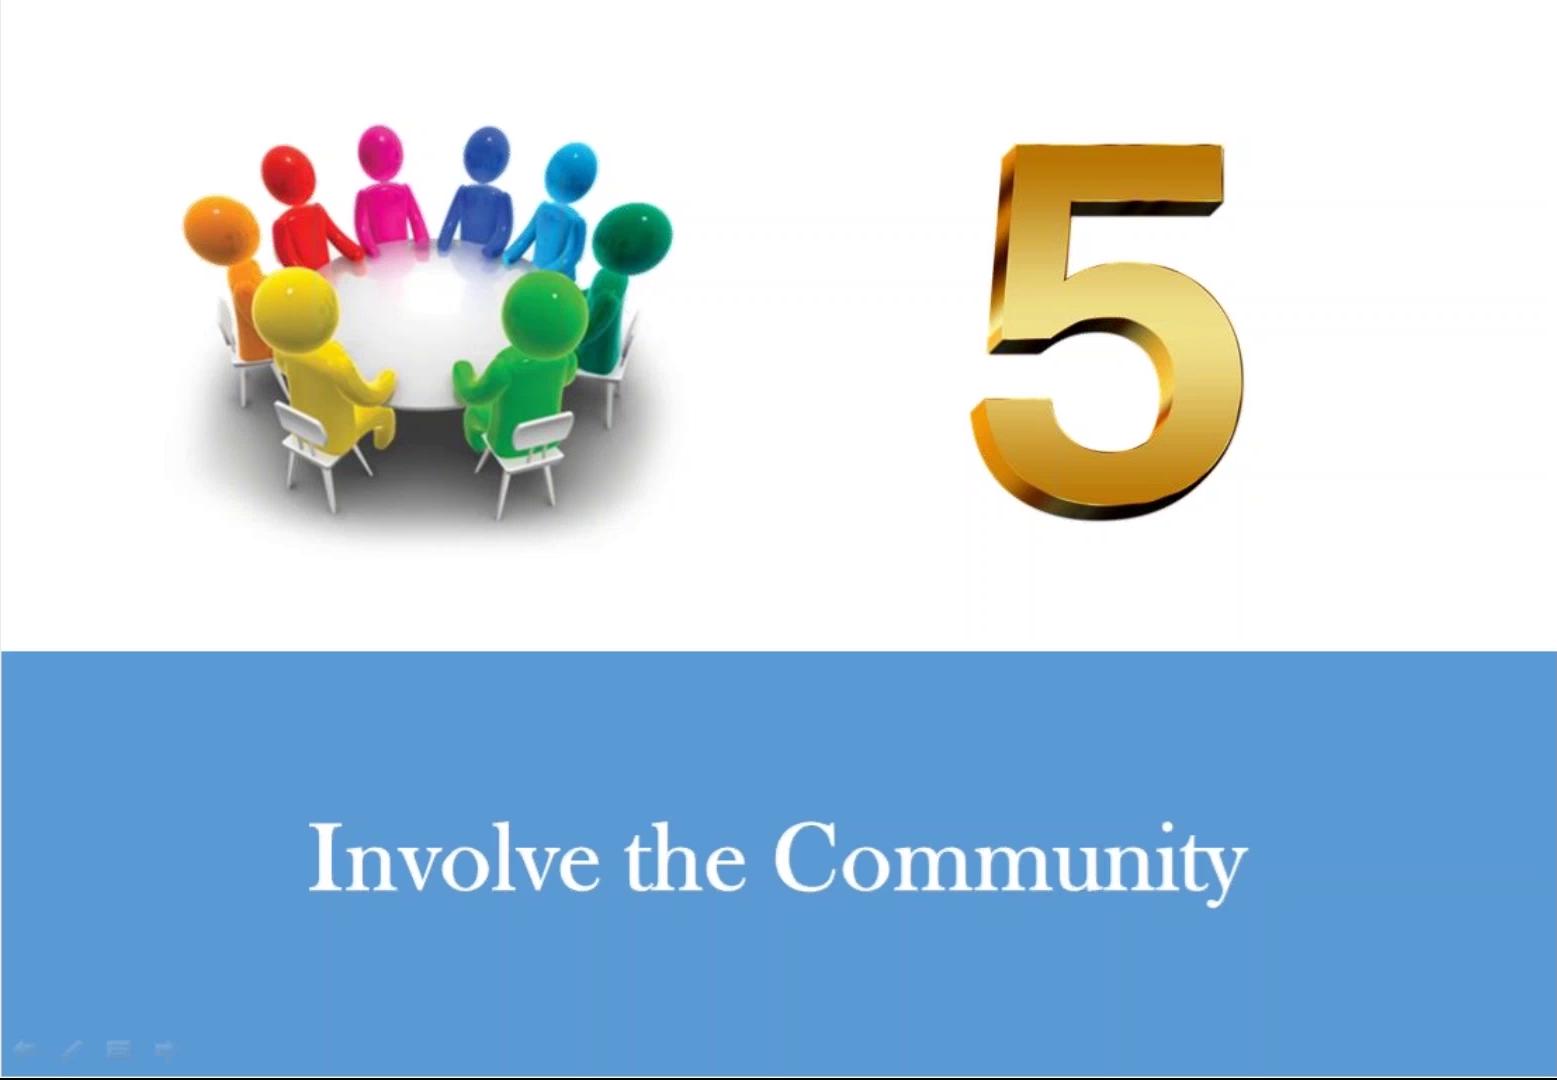 Involving the community